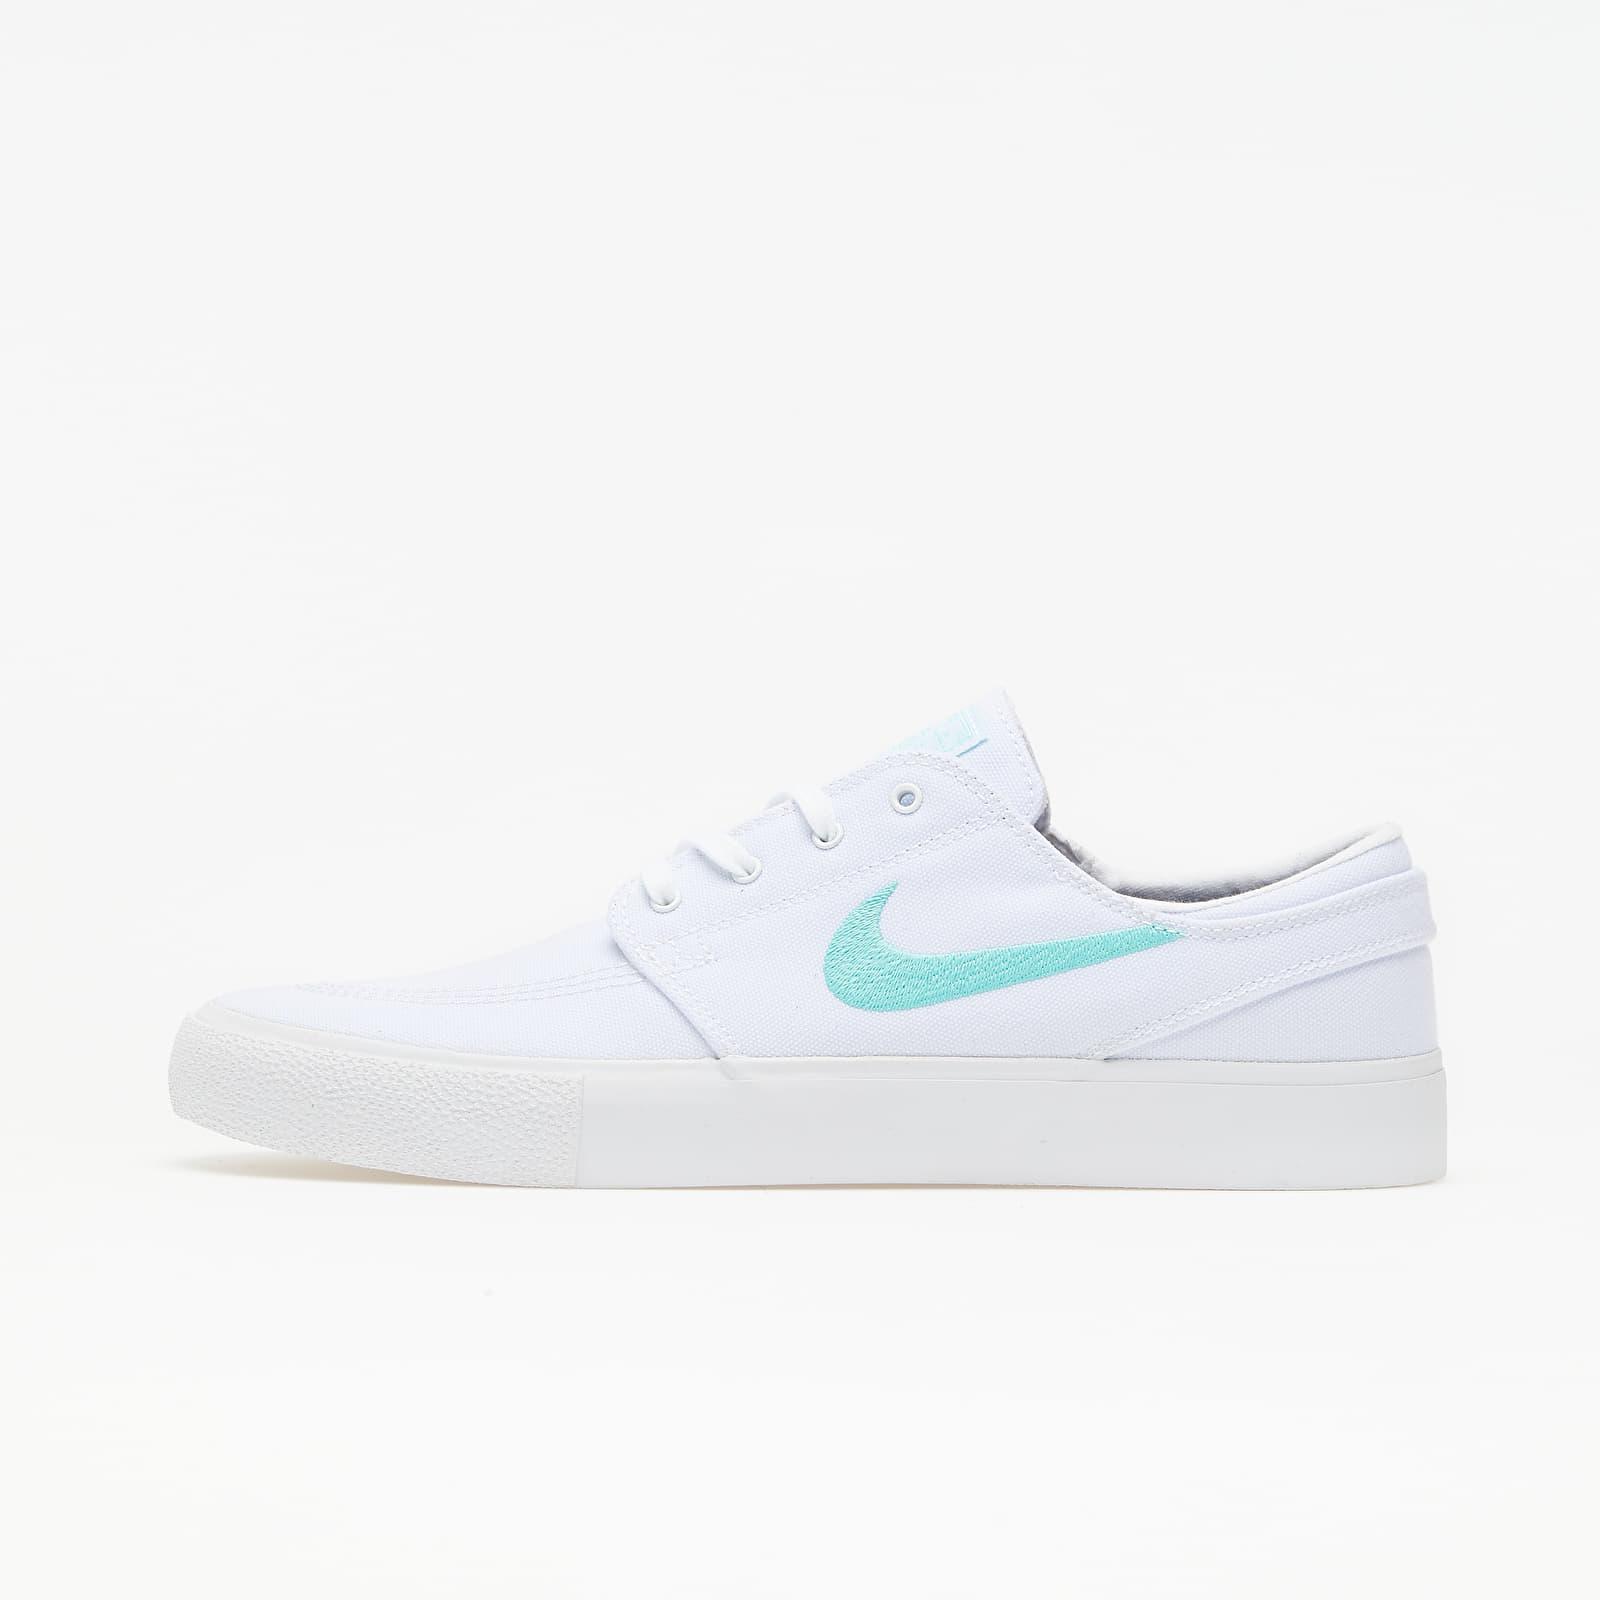 Pánské tenisky a boty Nike SB Zoom Stefan Janoski Canvas RM White/ Tropical Twist-White